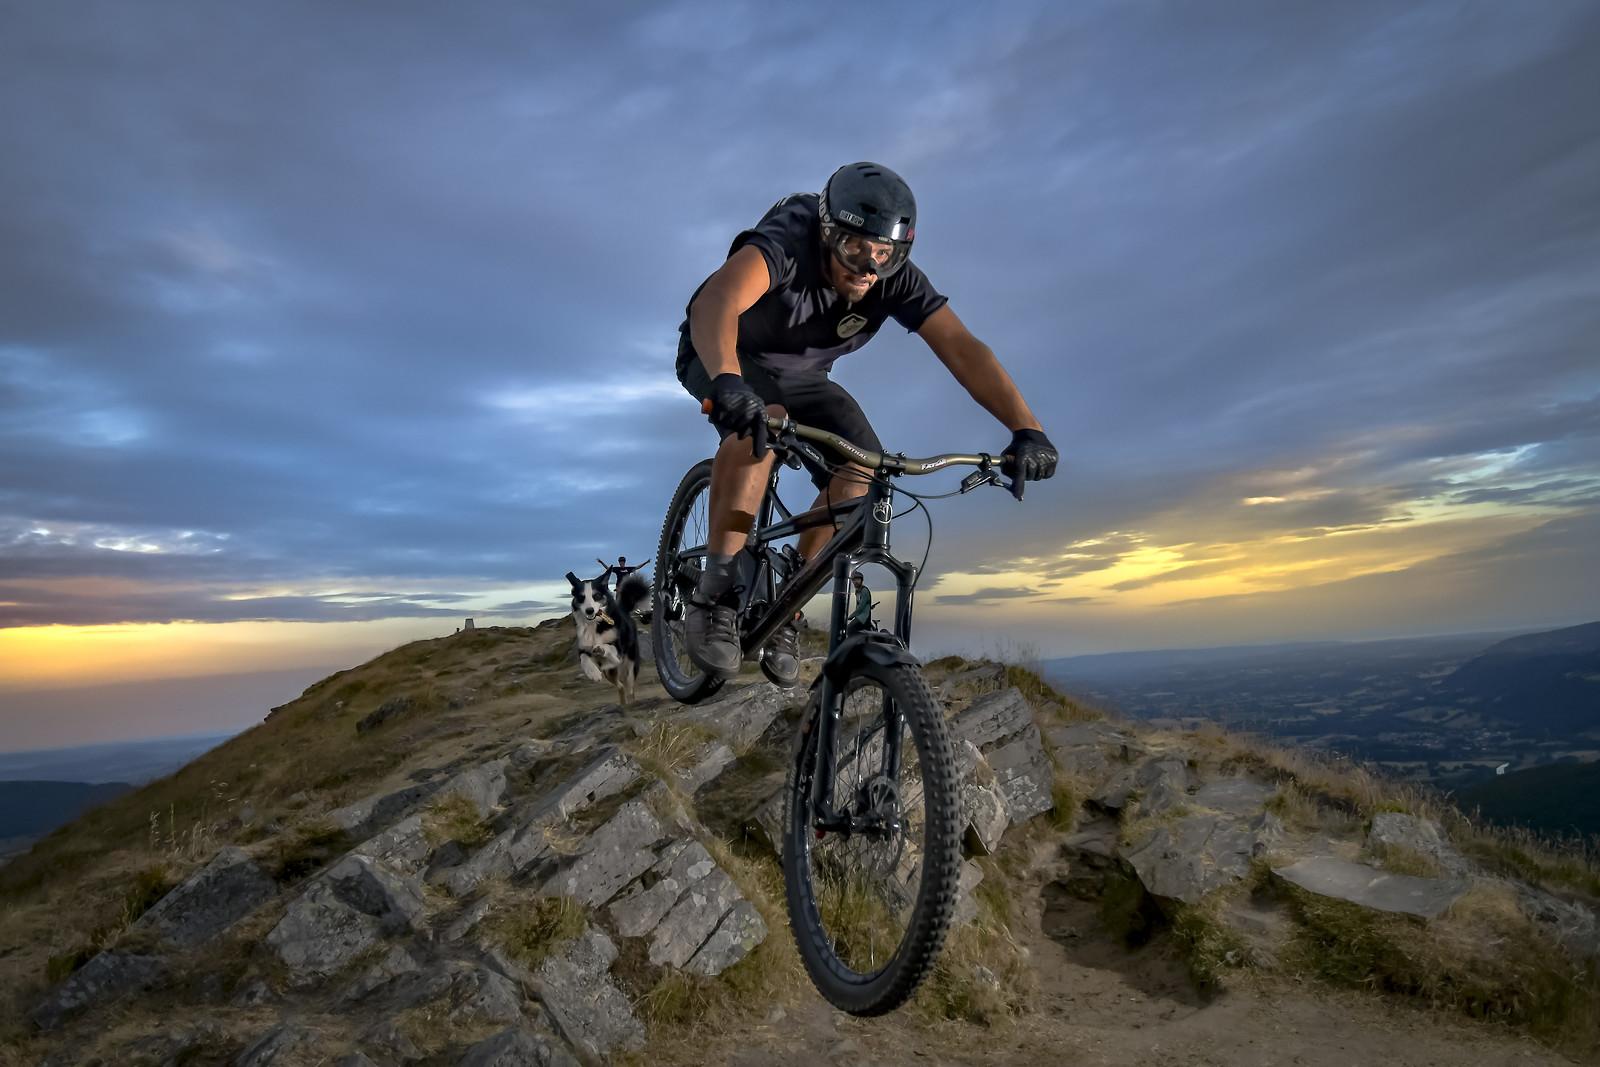 ROB2203 - robbarkerimages2017 - Mountain Biking Pictures - Vital MTB